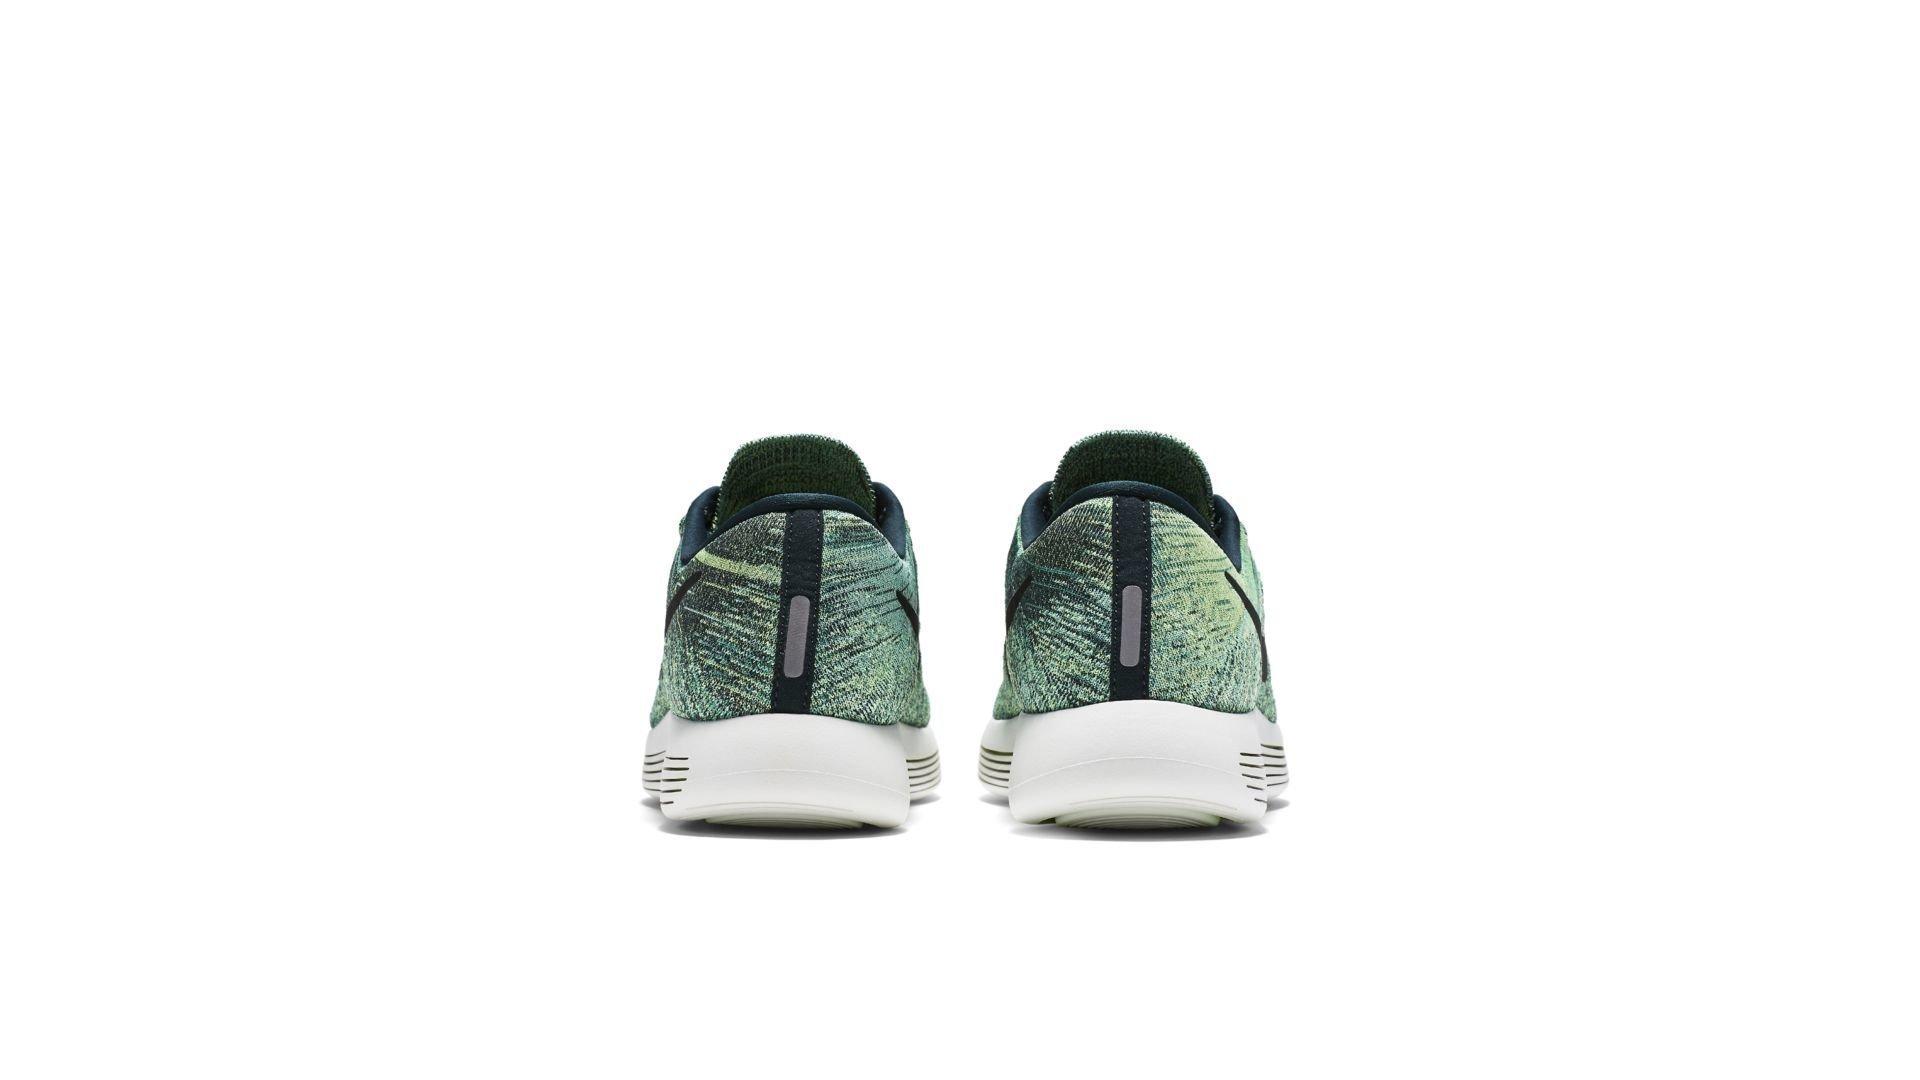 Nike LunarEpic Low Flyknit Seaweed (843764-300)